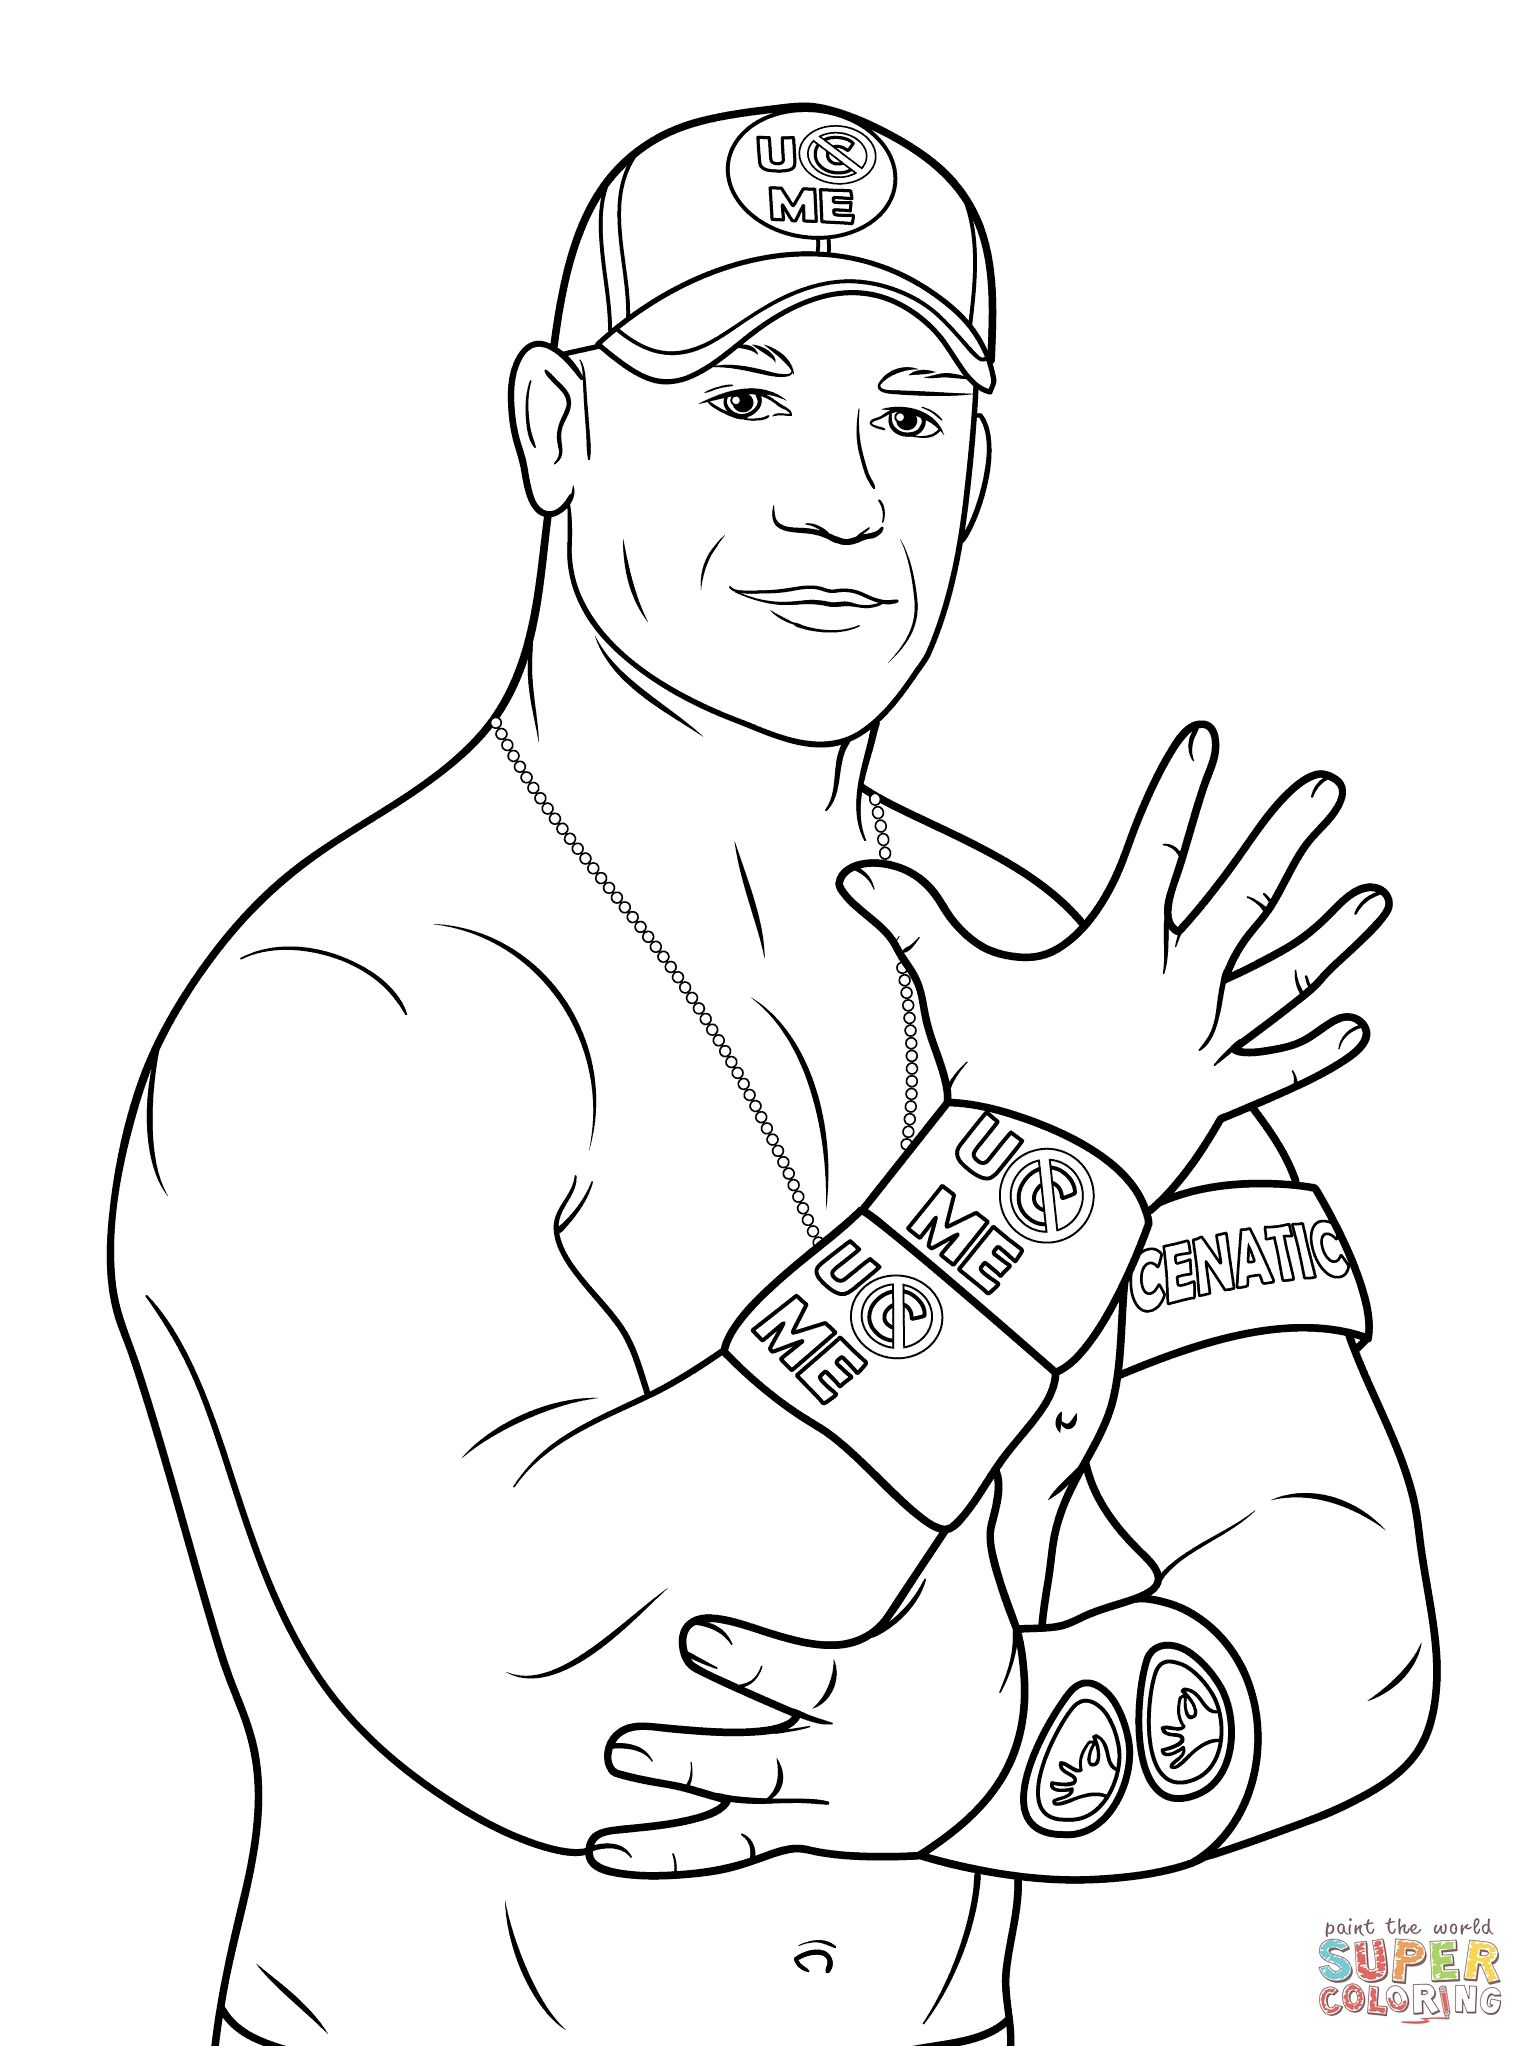 John Cena Coloring Pages Free Printable Di 2020 John Cena Wwe